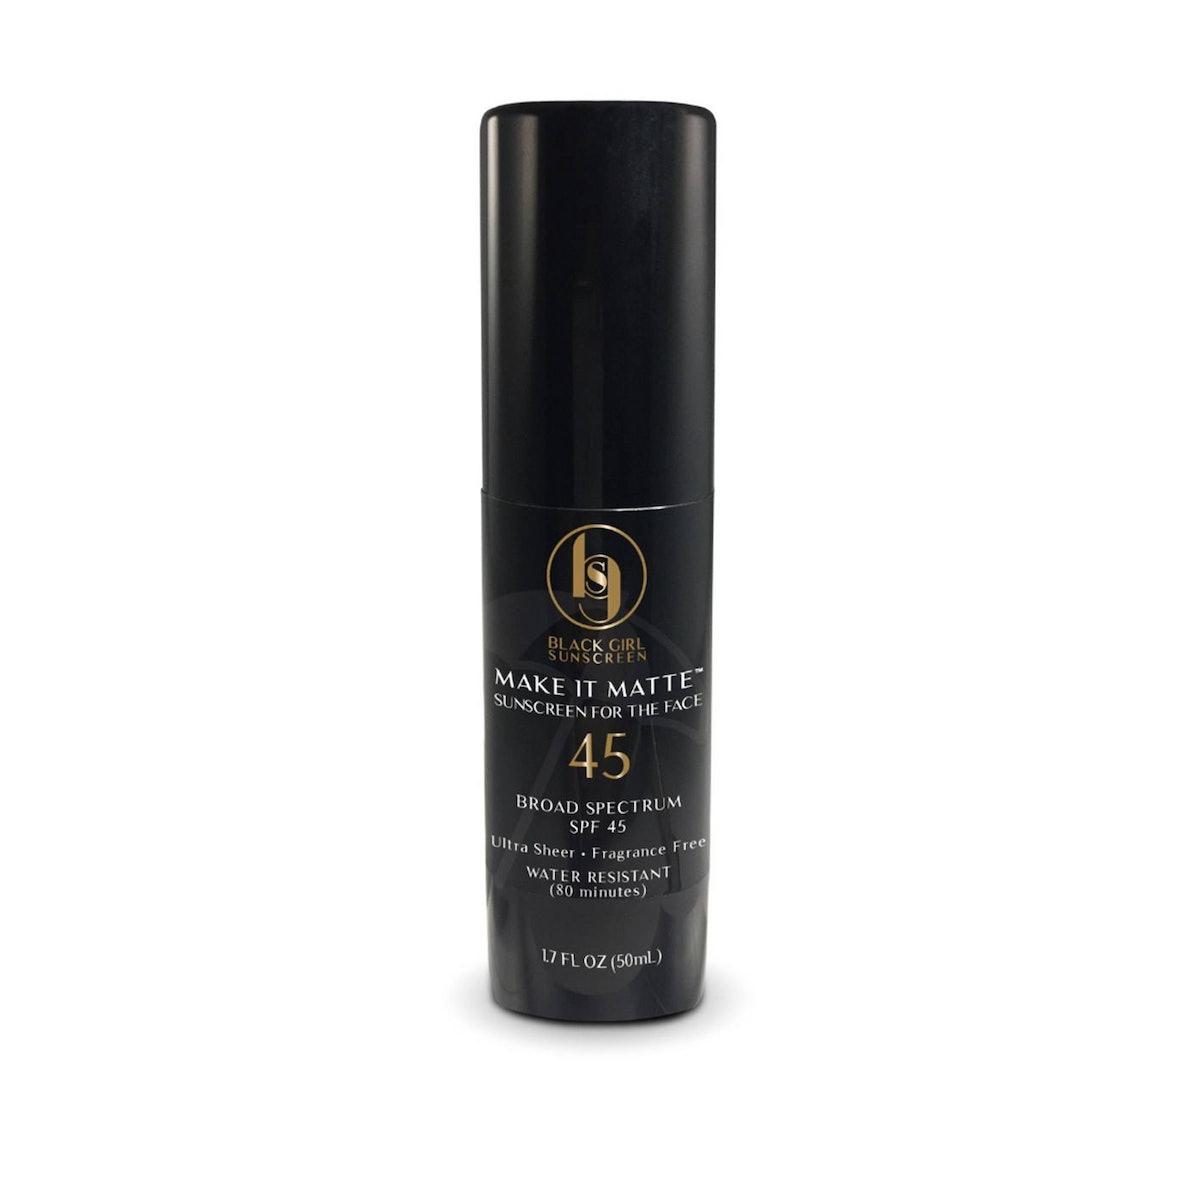 Black Girl Sunscreen Make It Matte Sunscreen - SPF 45